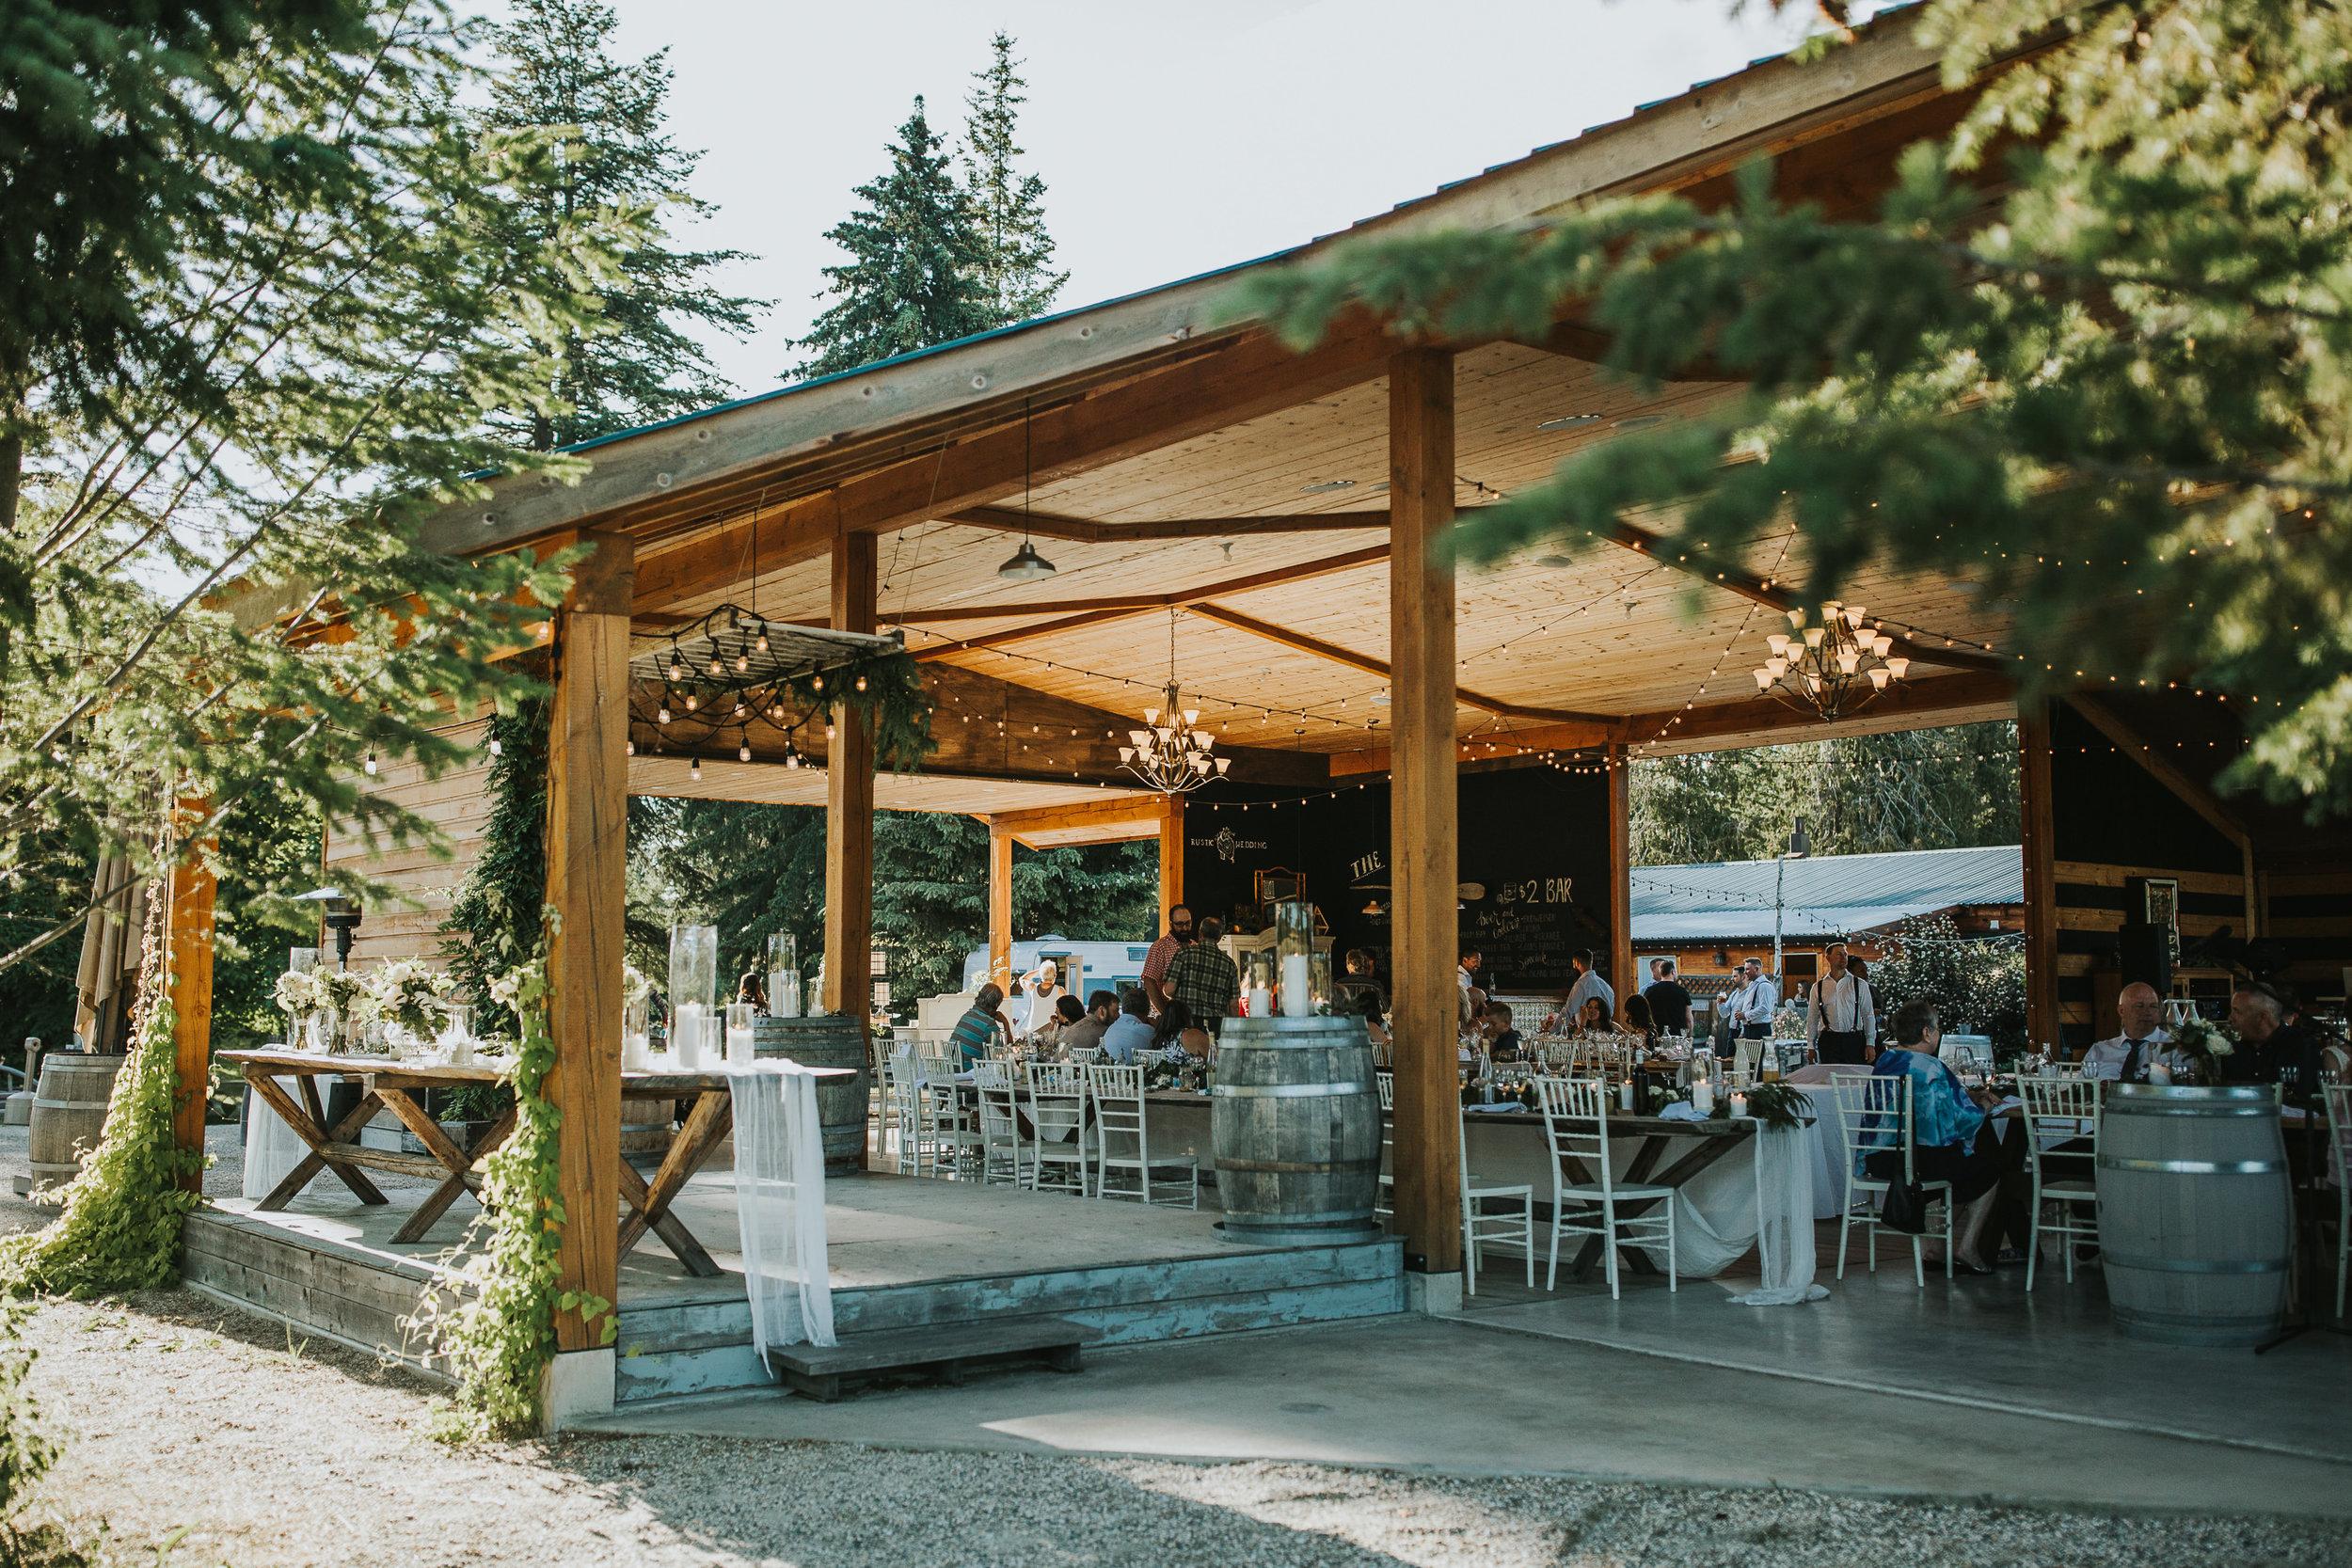 Kamloops-Shuswap-Wedding-R&K-Blog-Mint-Photography-87.jpg